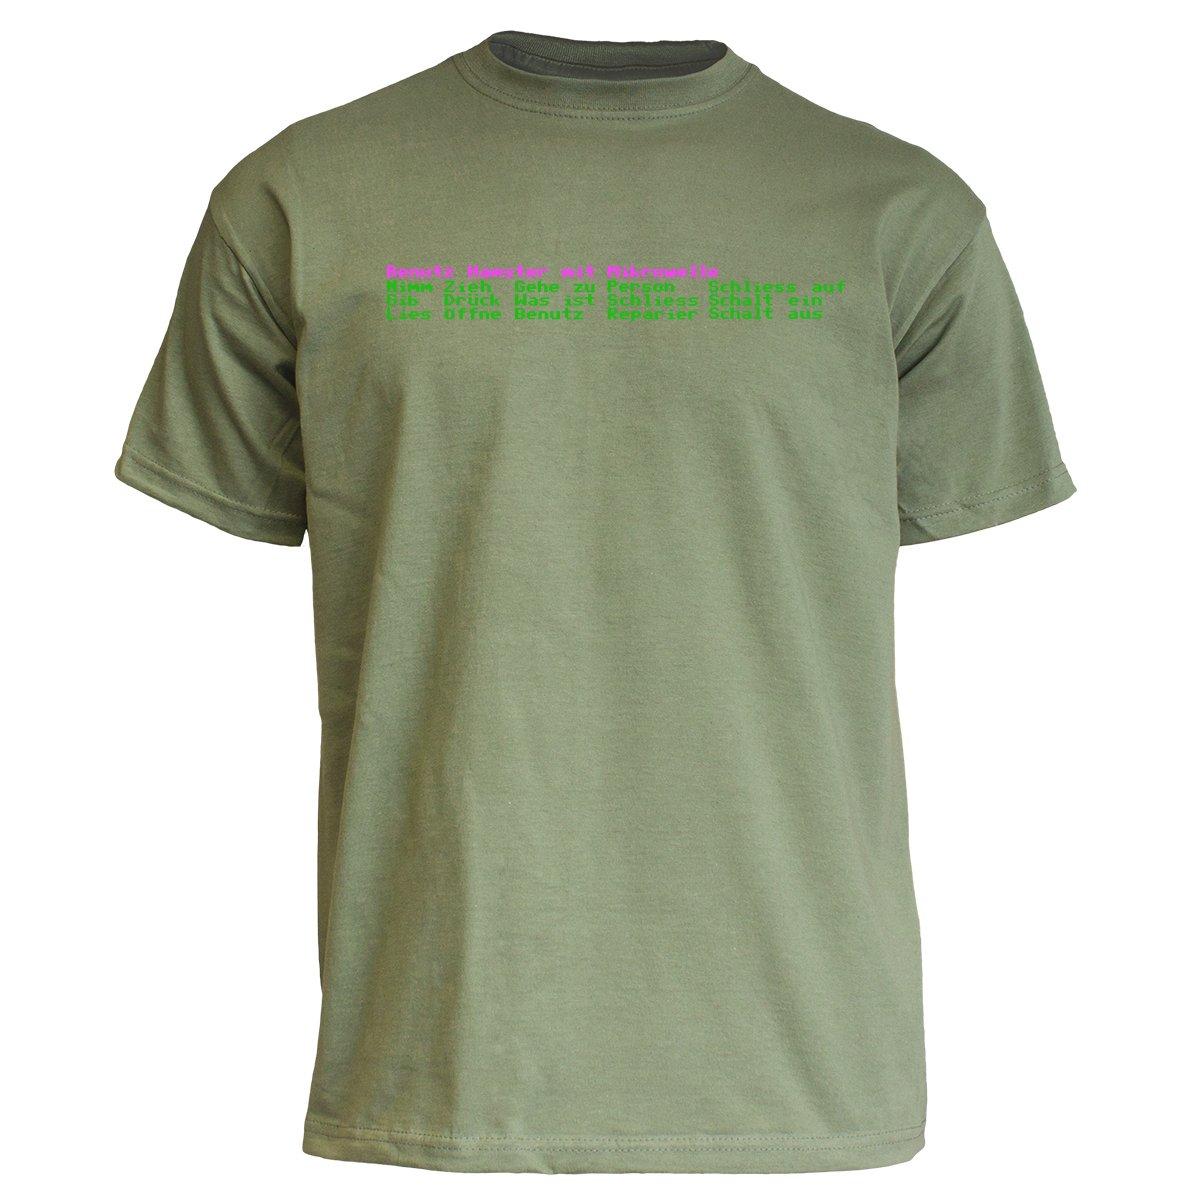 "Nukular T-Shirt ""Adventure"" (Auswahl-Menü) Benutz Hamster mit Mikrowelle... 777180"